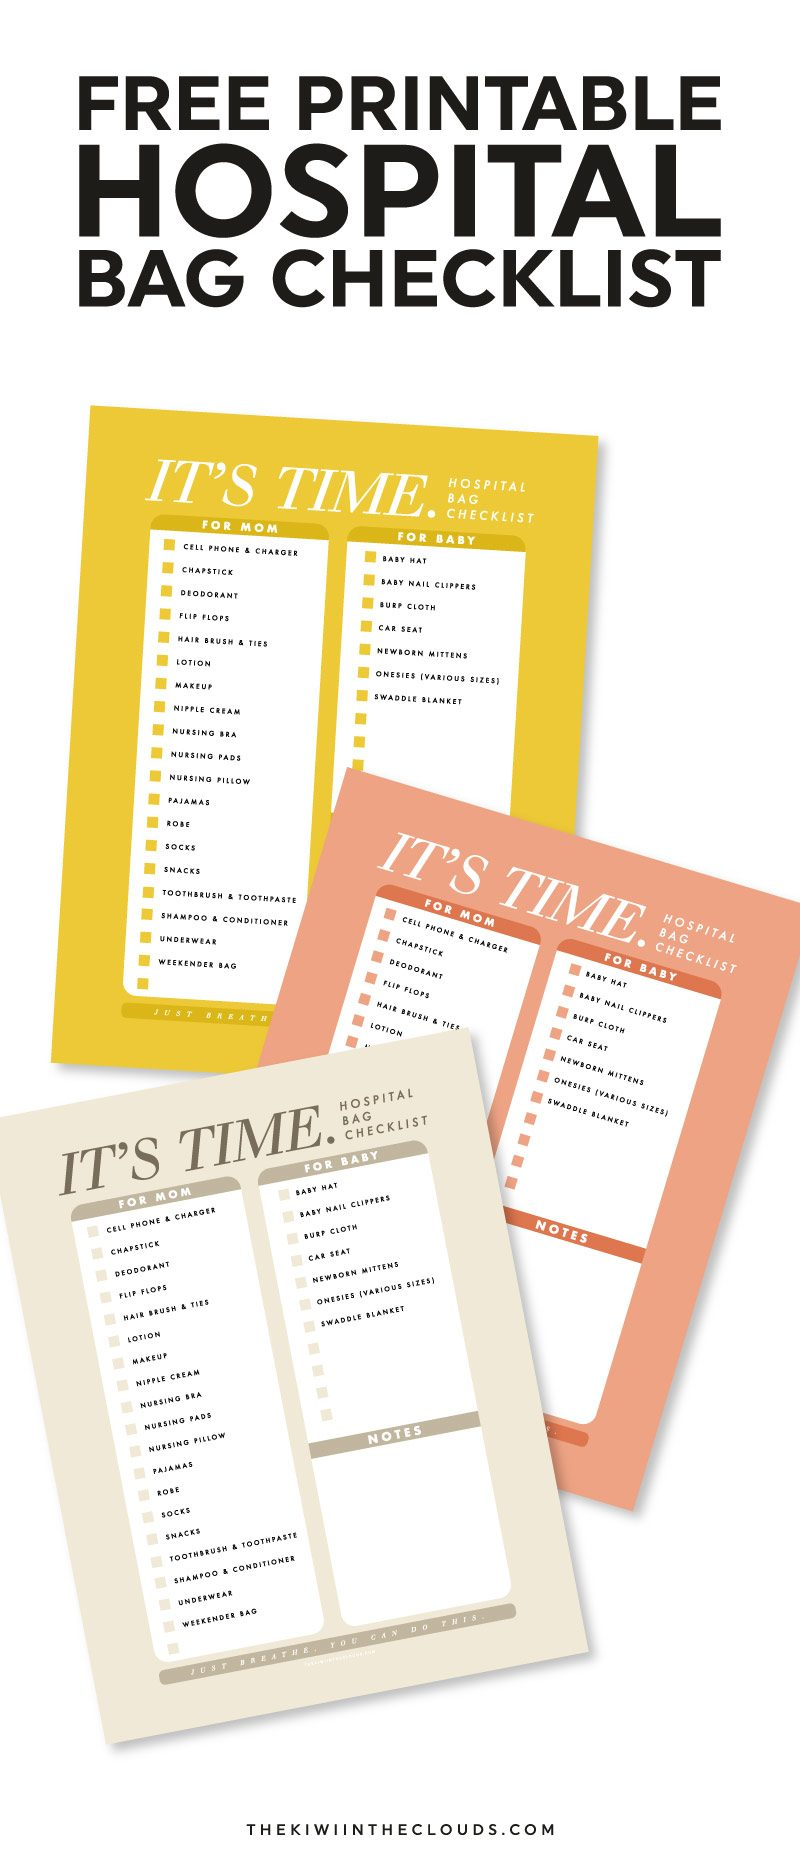 The No Nonsense Guide To The Hospital Bag Checklist Freebie